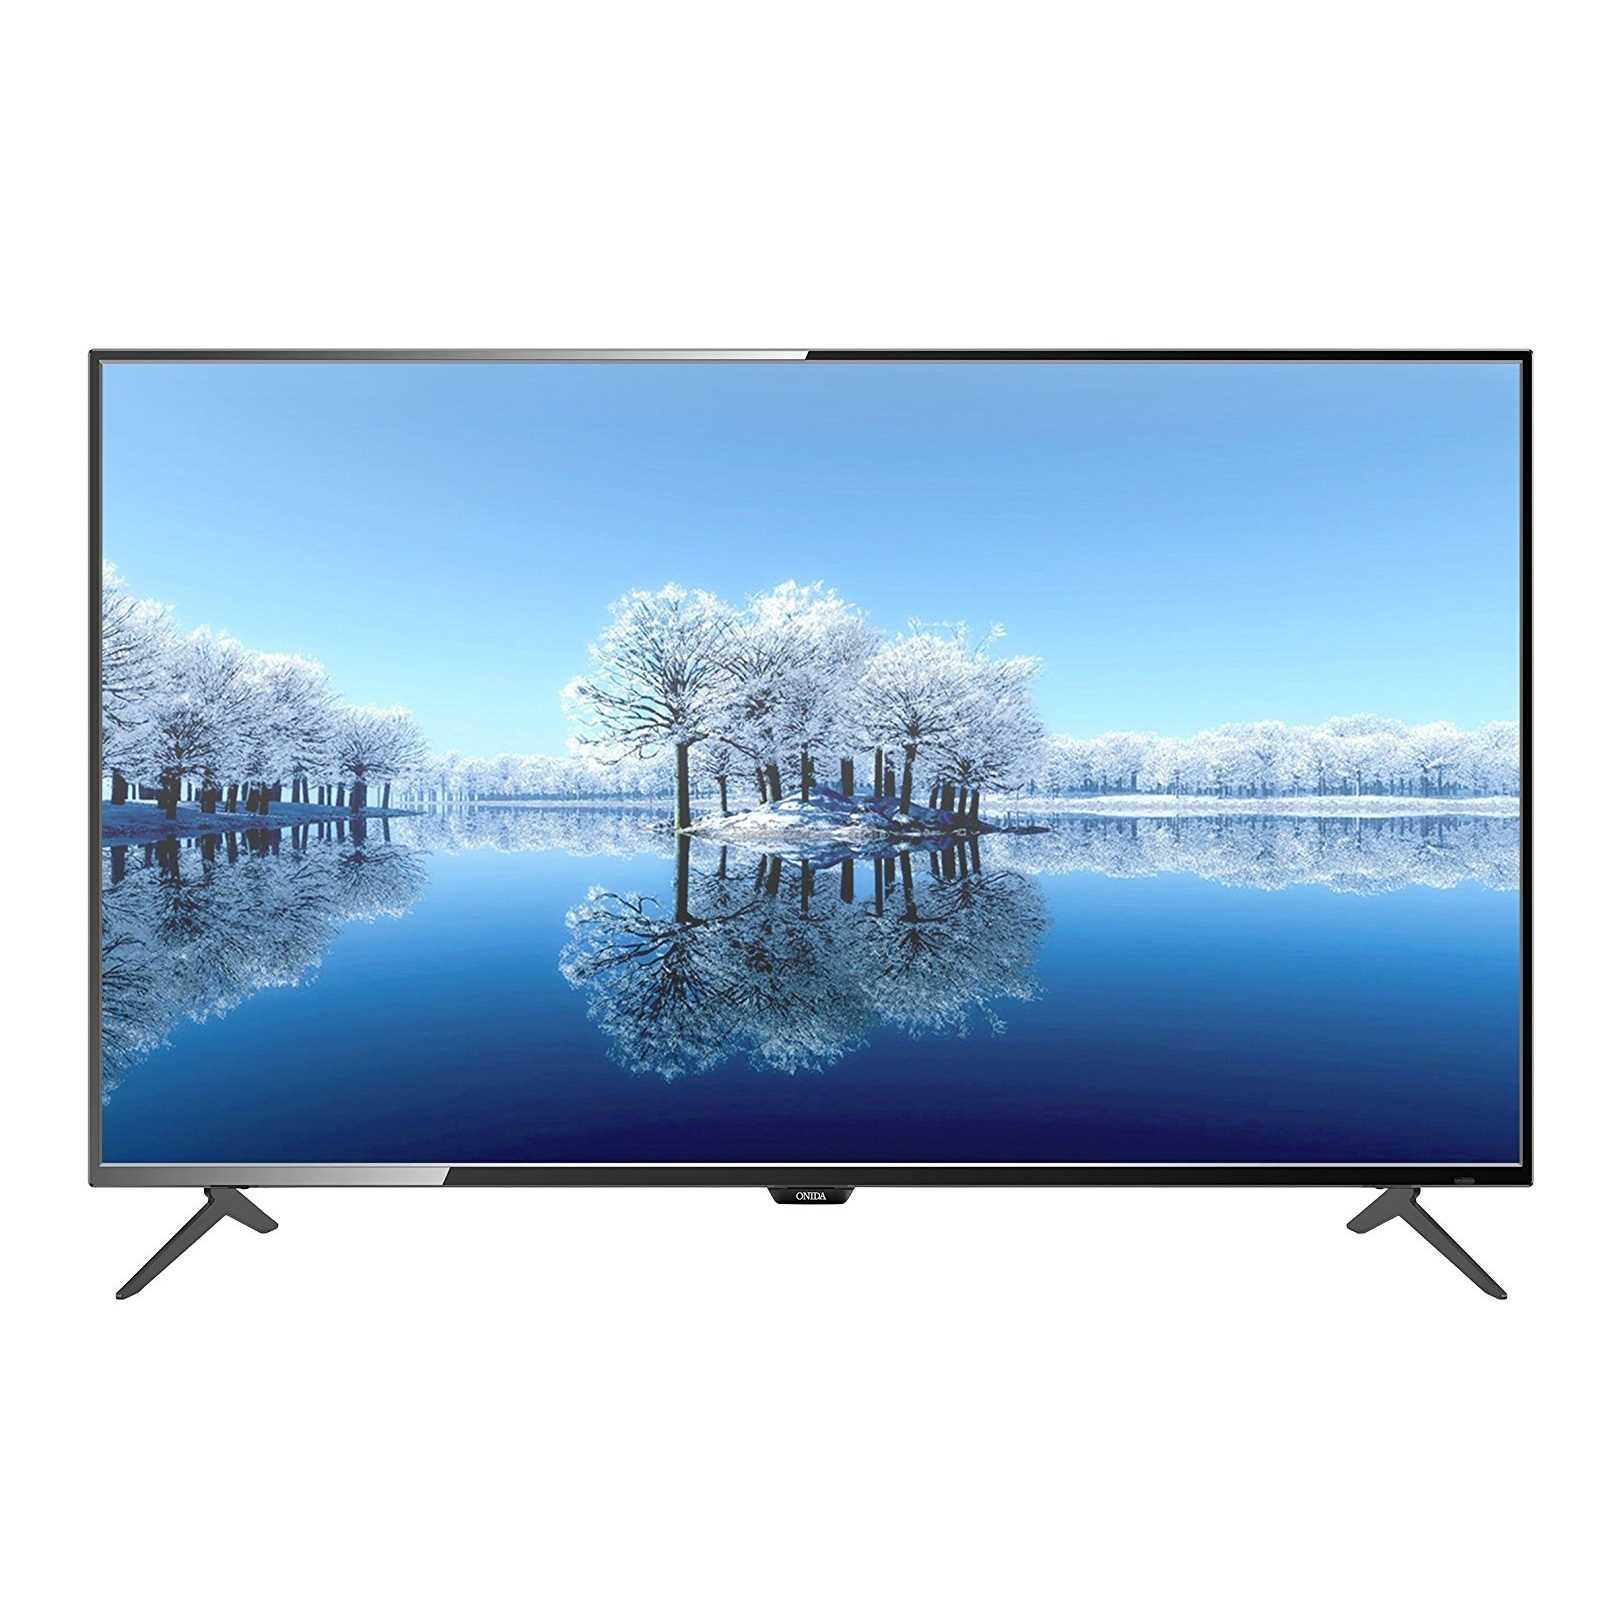 Onida 50UIB 50 Inch 4K Ultra HD Smart LED Television